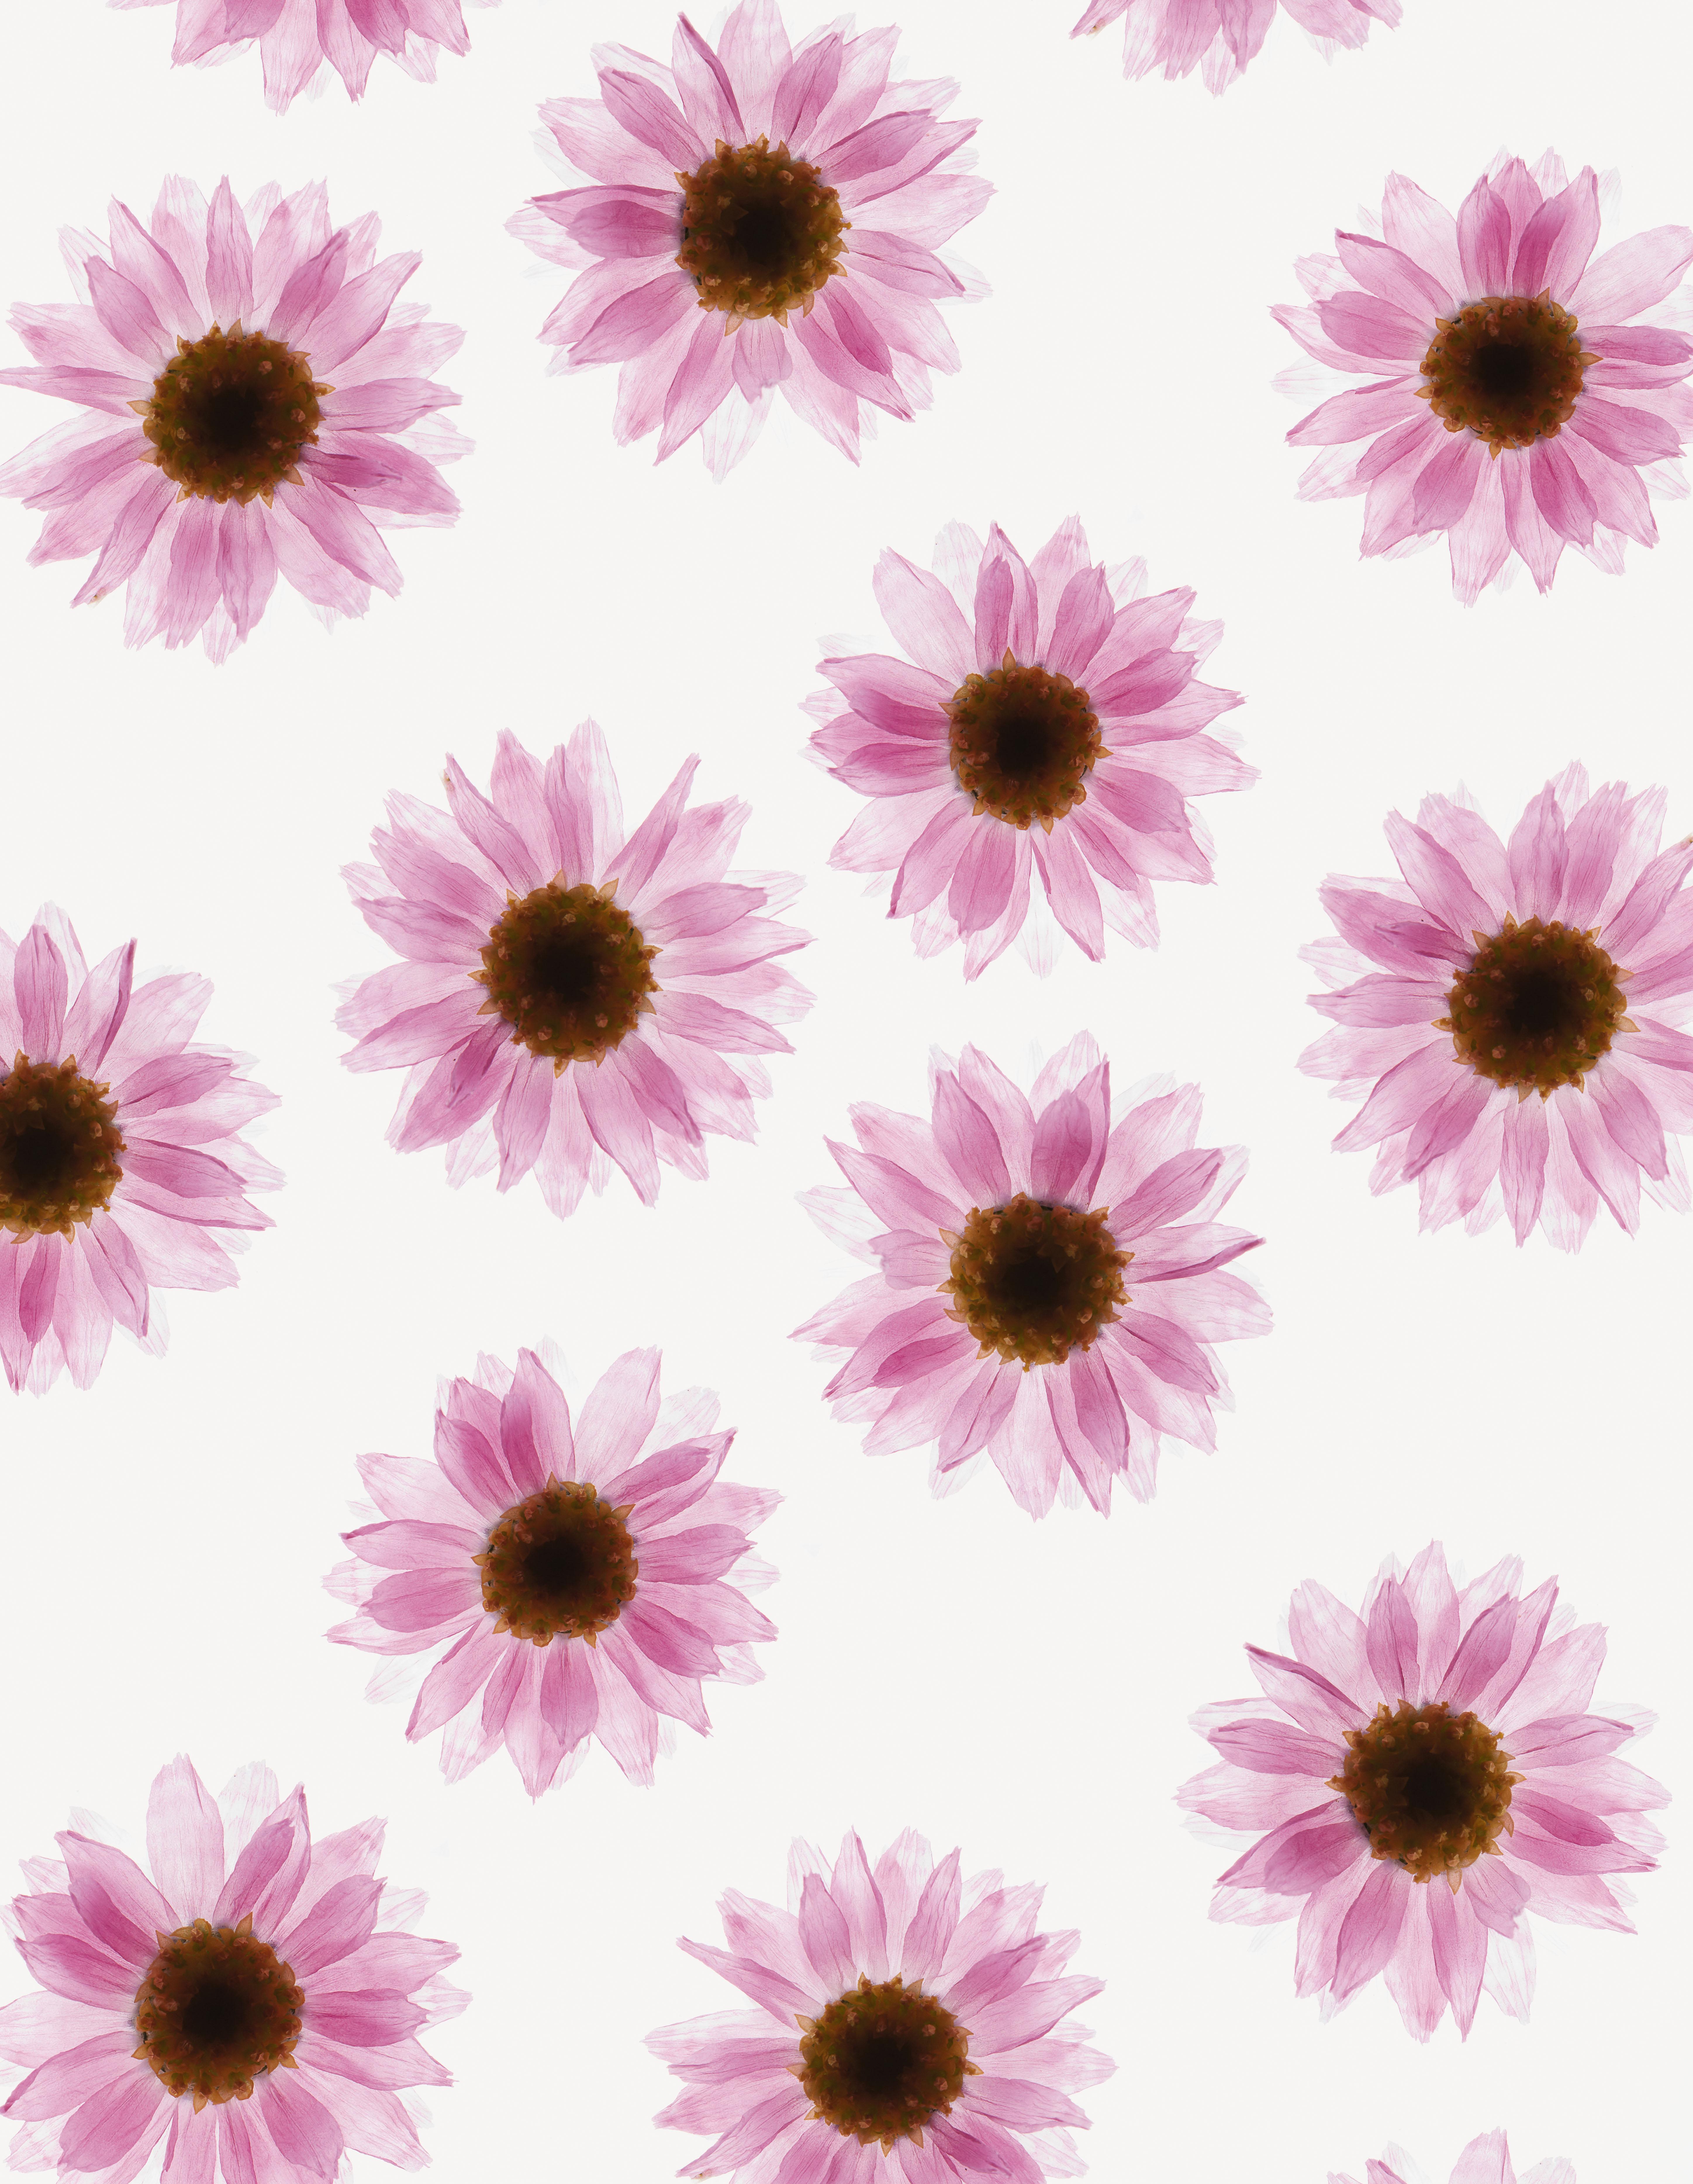 Fleurs Hermetica : Immortelles